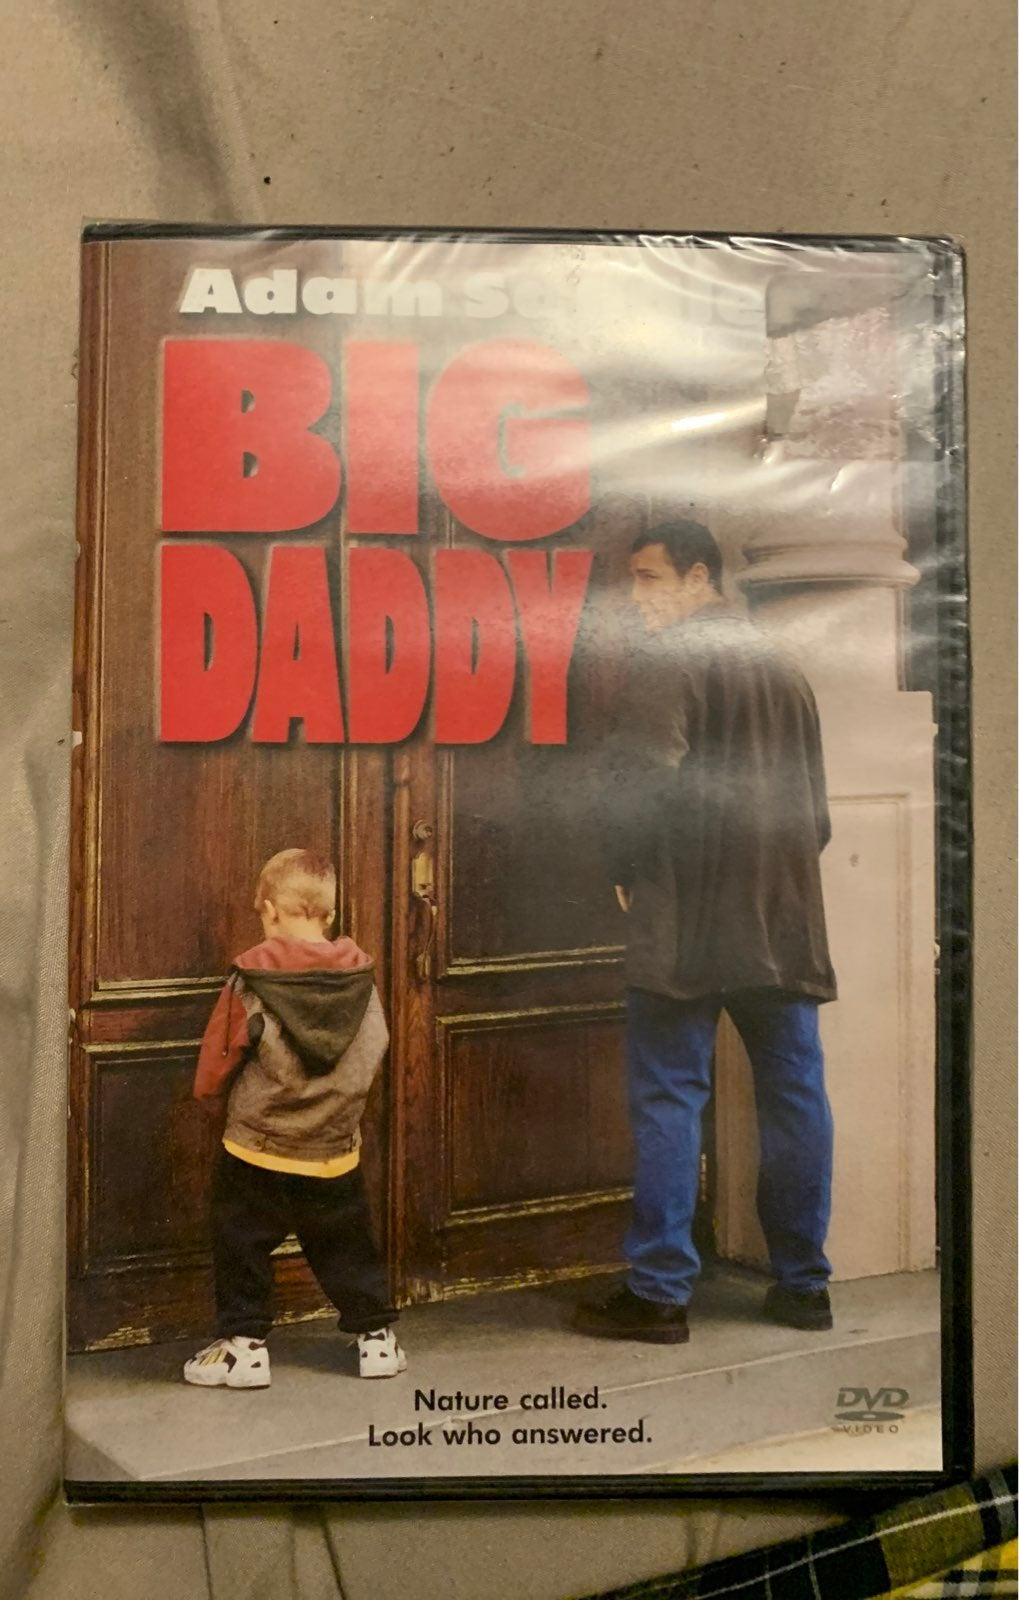 Big Daddy DVD